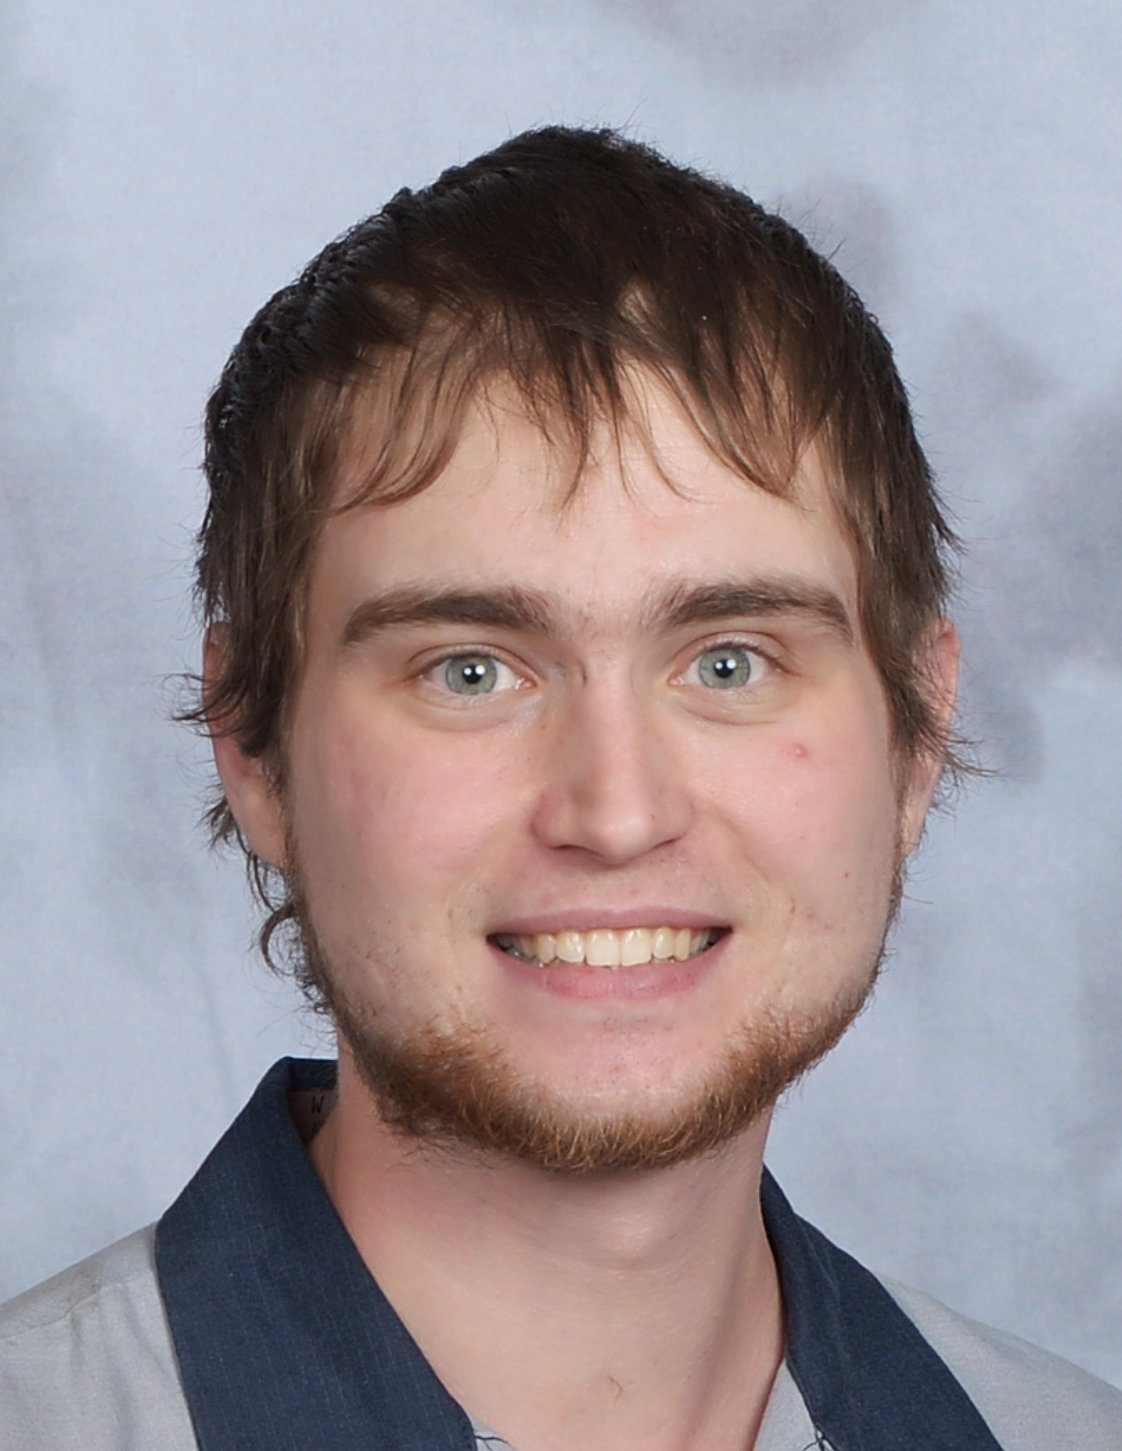 Erick Hinchcliff - Service Technician